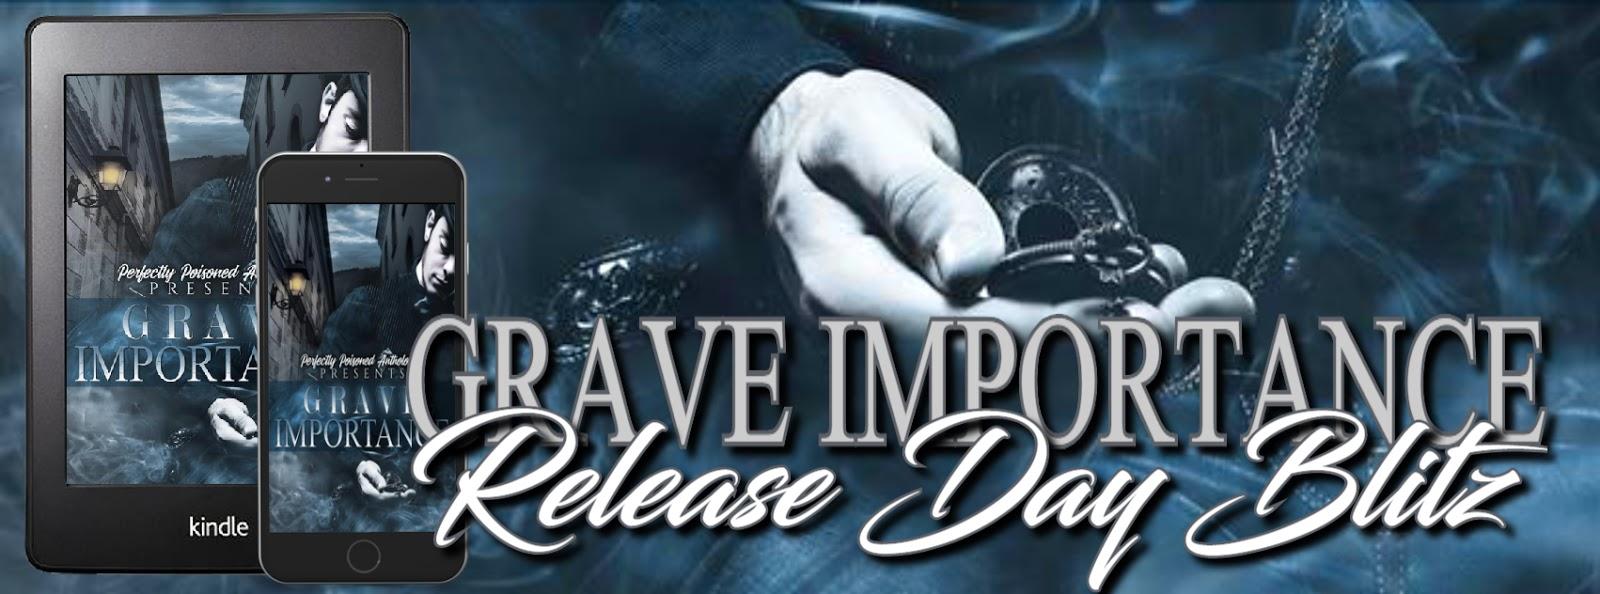 Release Day Blitz: Grave Importance